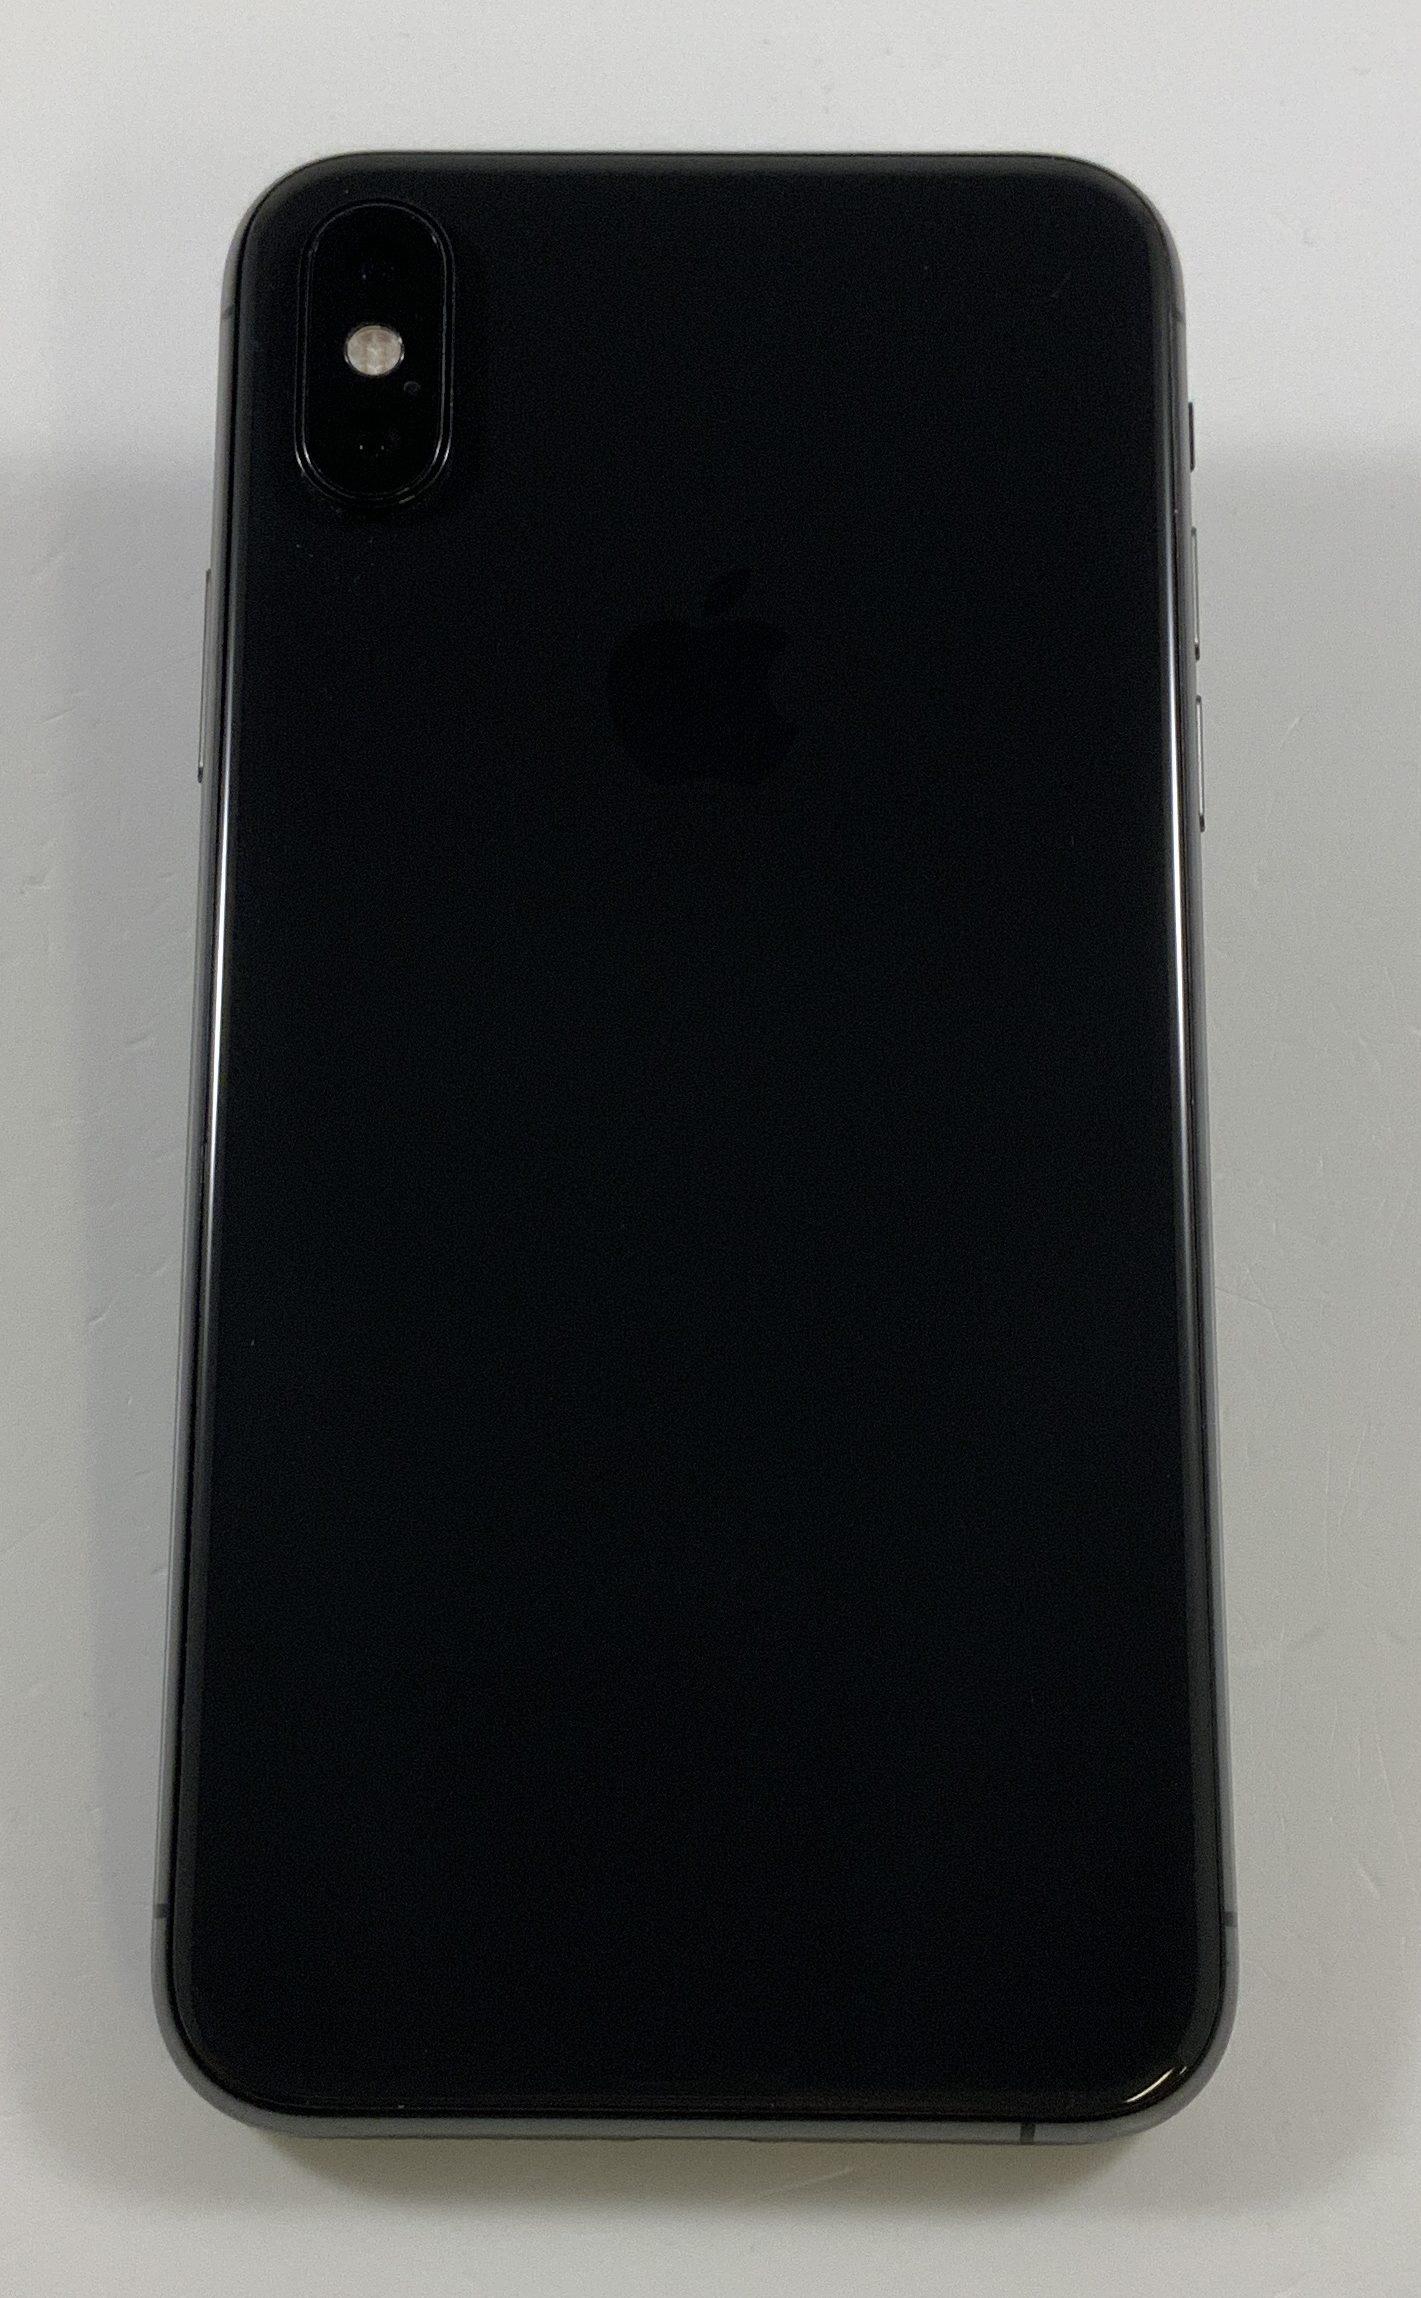 iPhone XS 64GB, 64GB, Space Gray, obraz 2